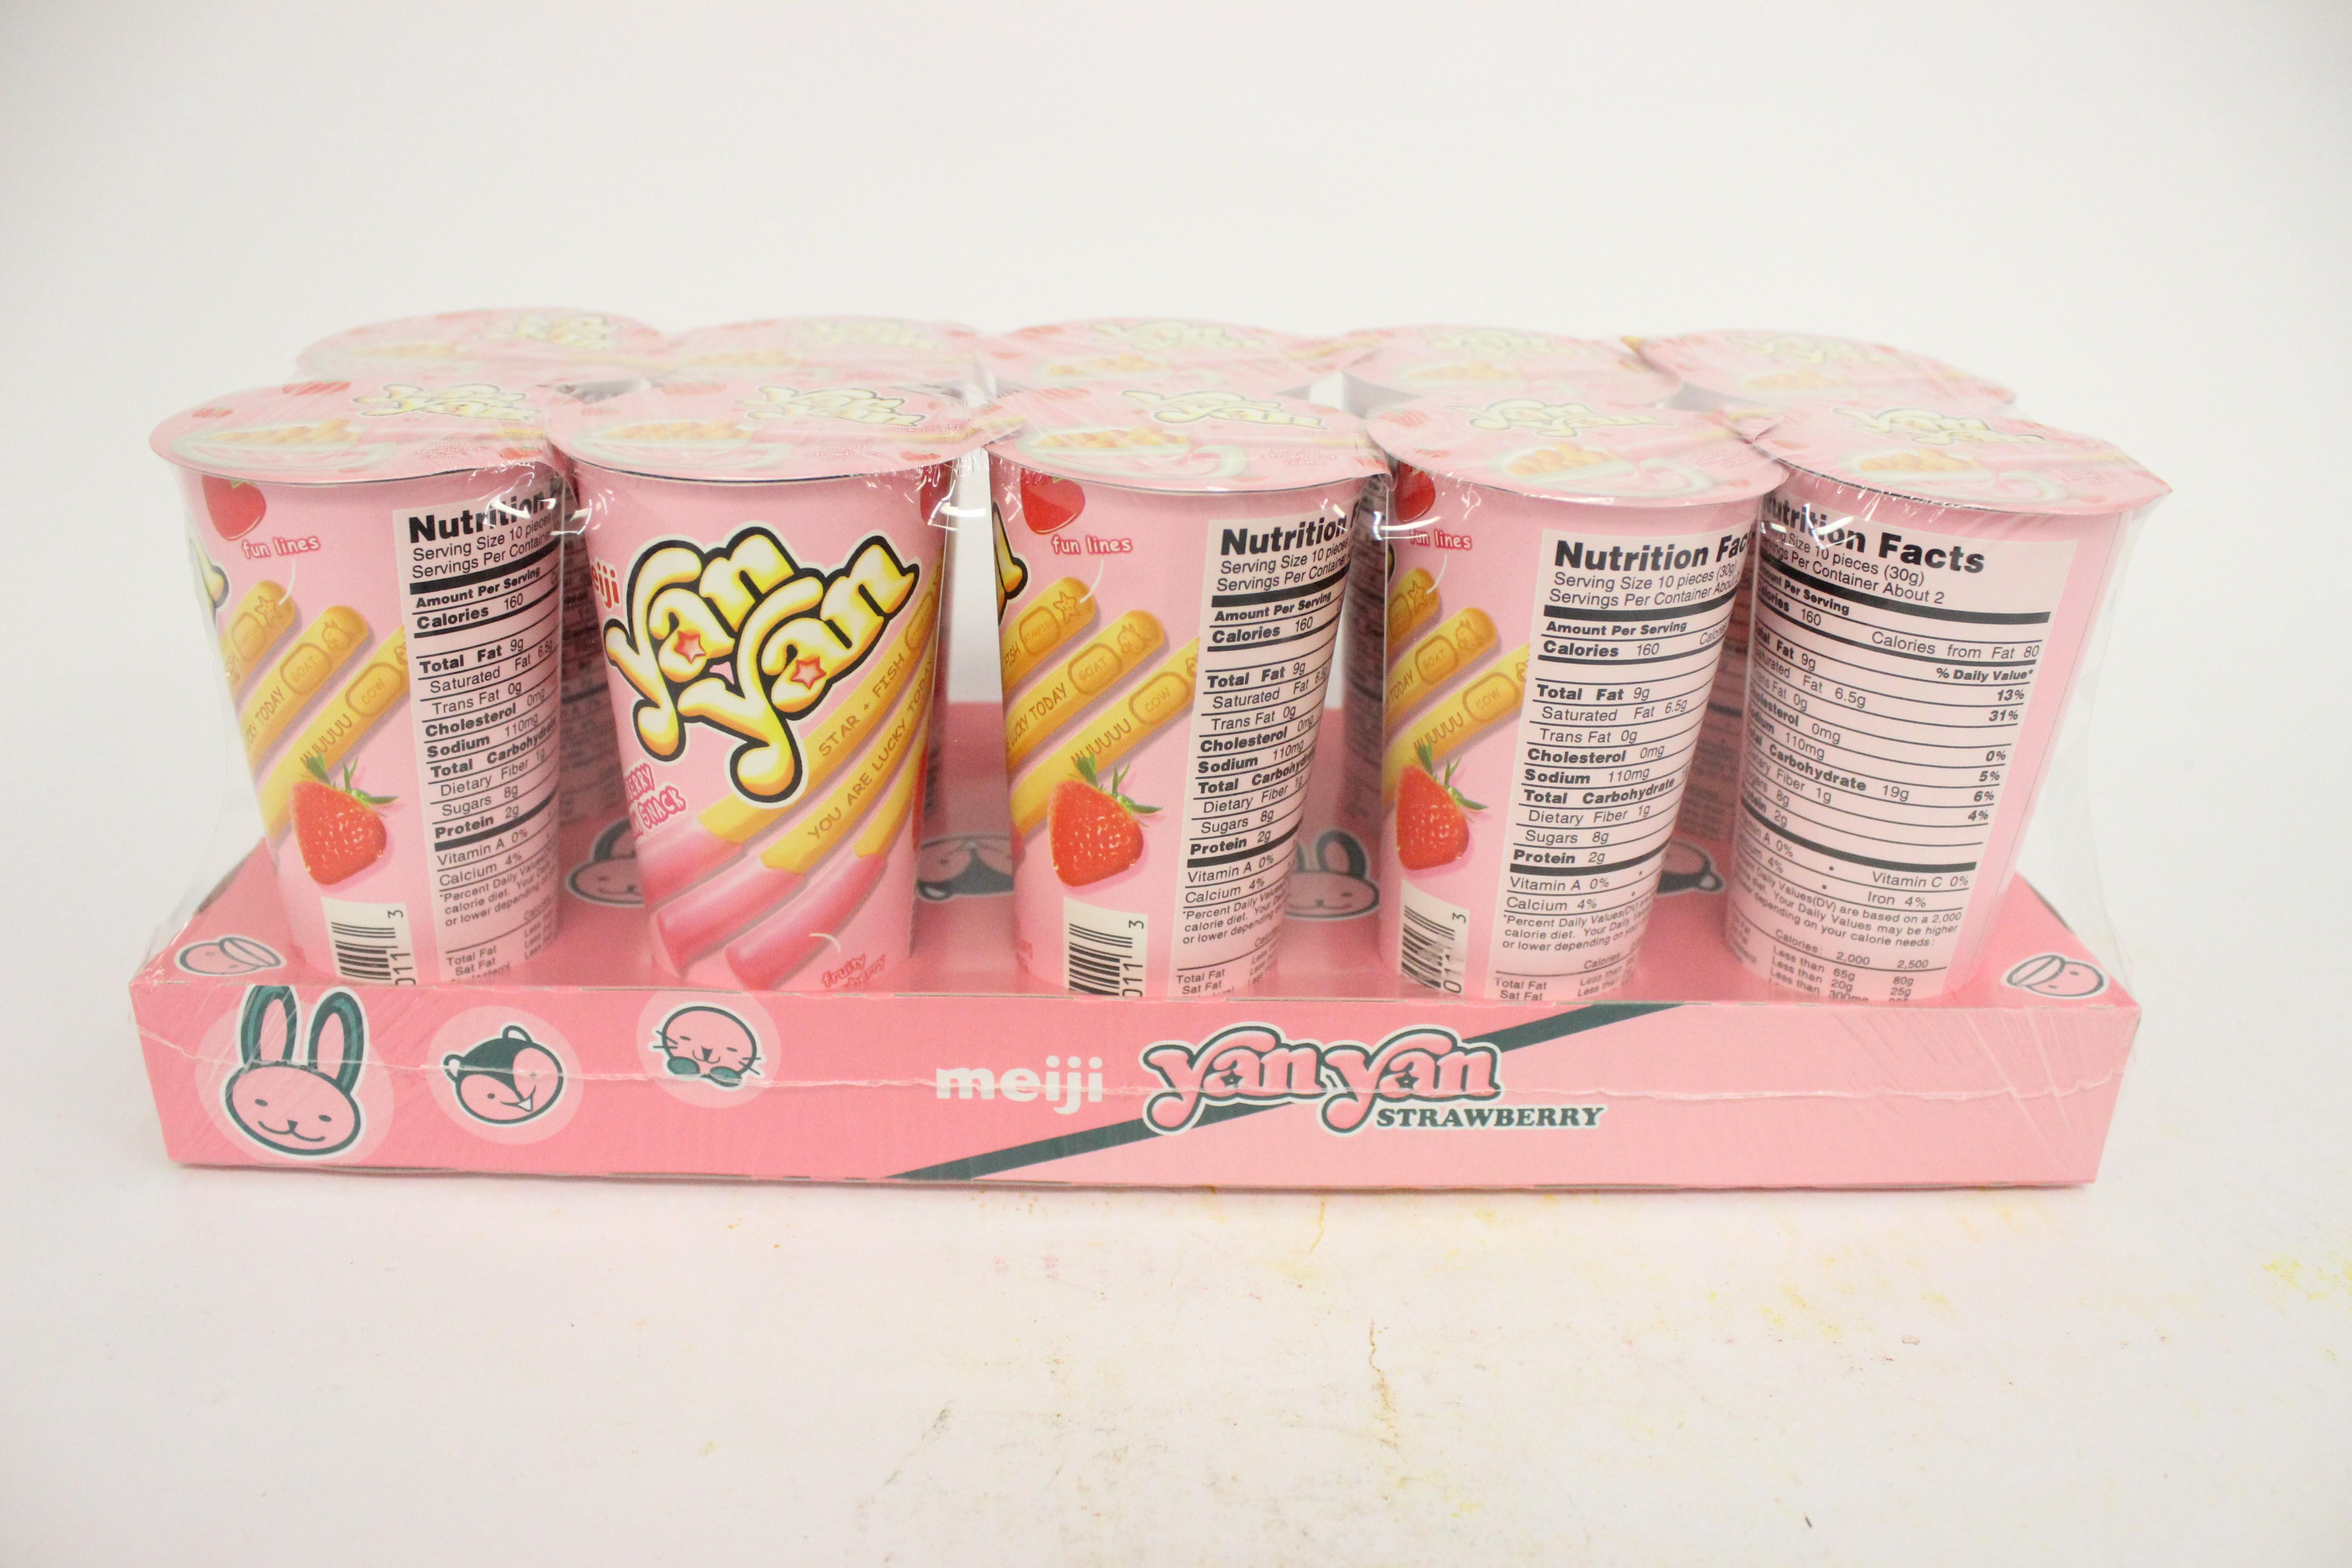 Yan Yan Strawberry Cream Dip 2 oz 10 Pack